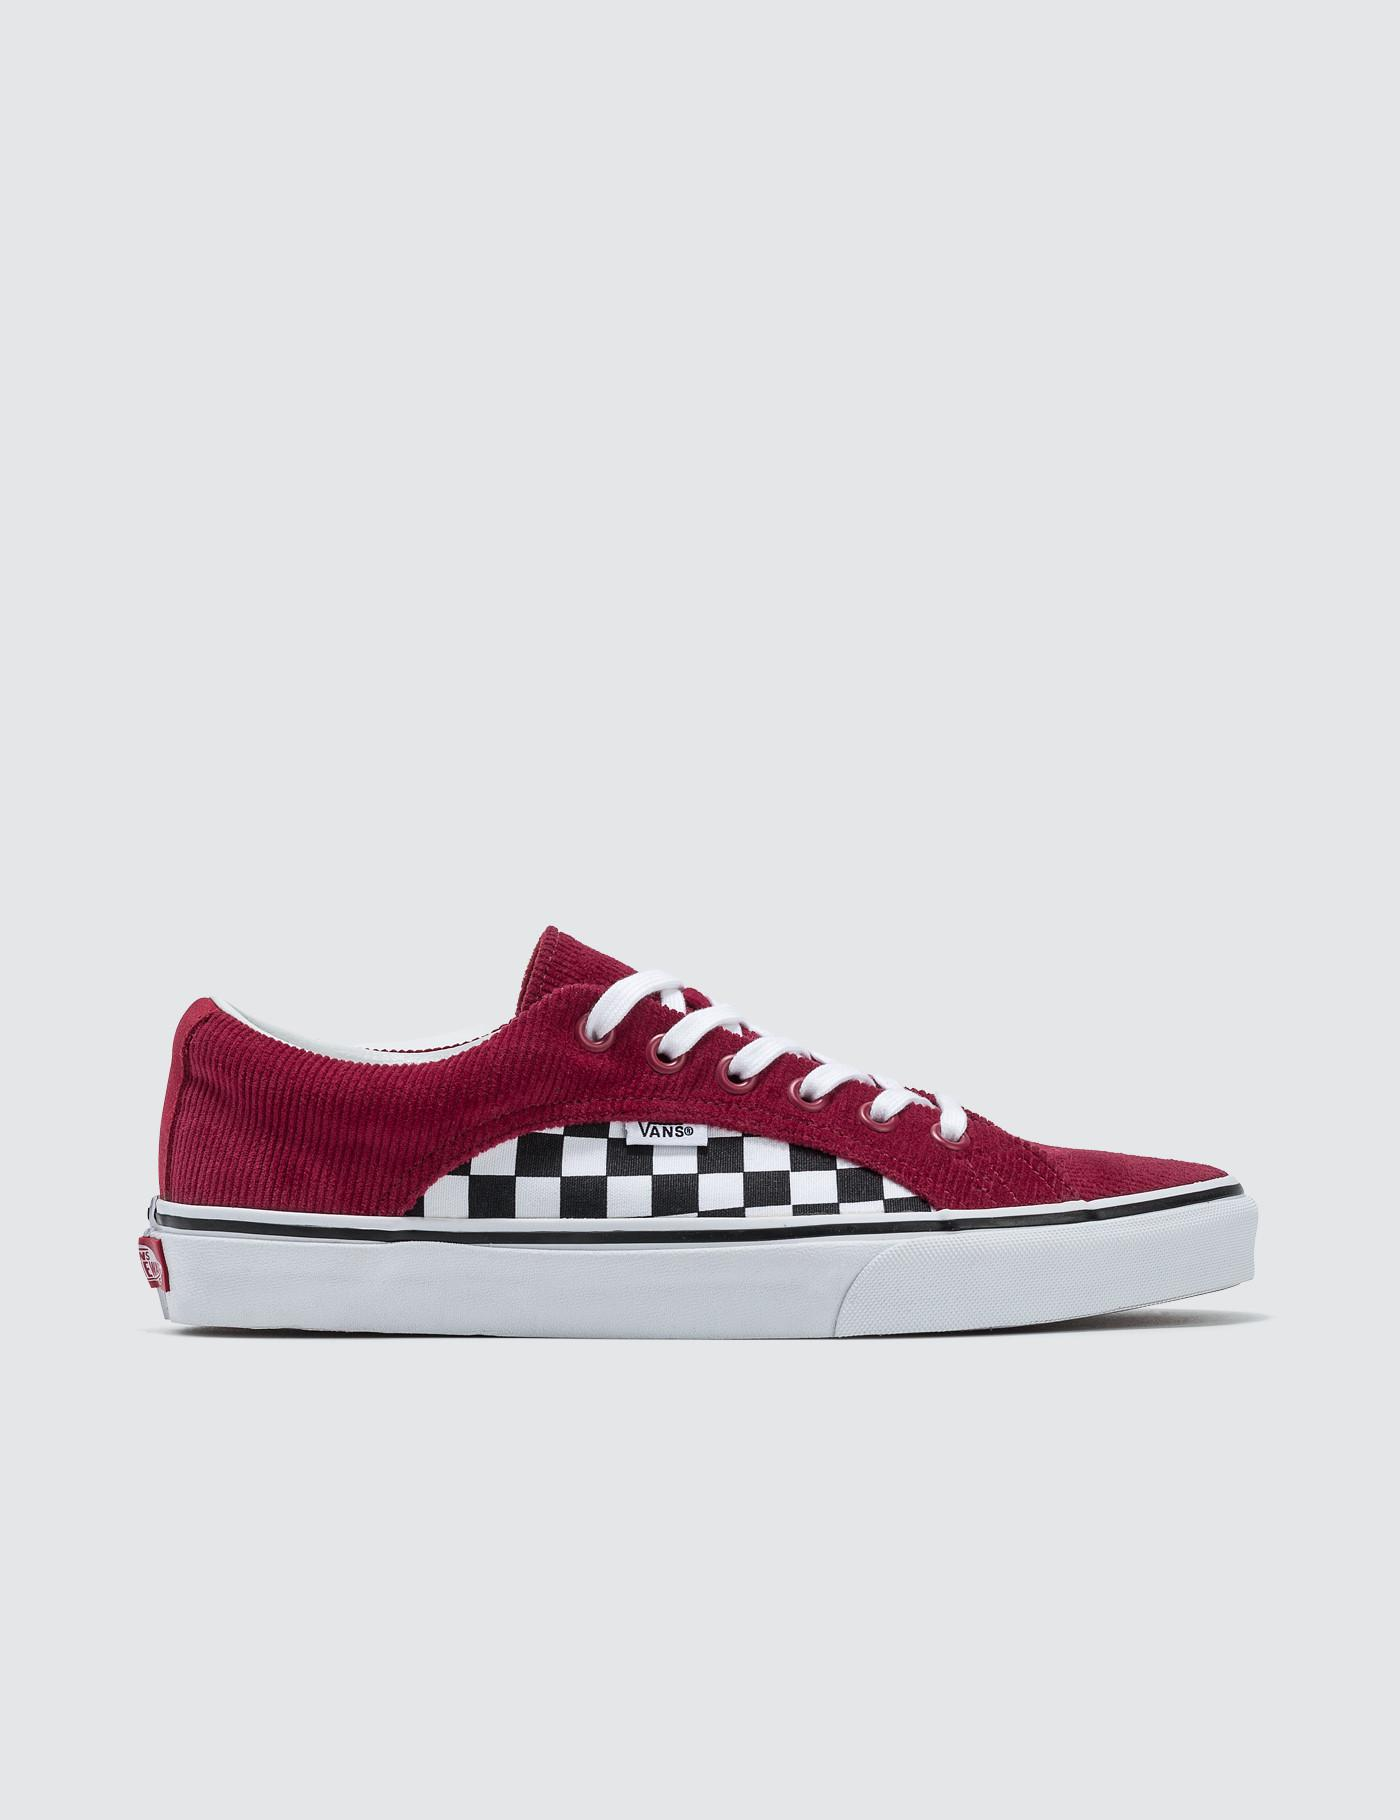 1f4df0ddd87664 Lyst - Vans Lampin in Red